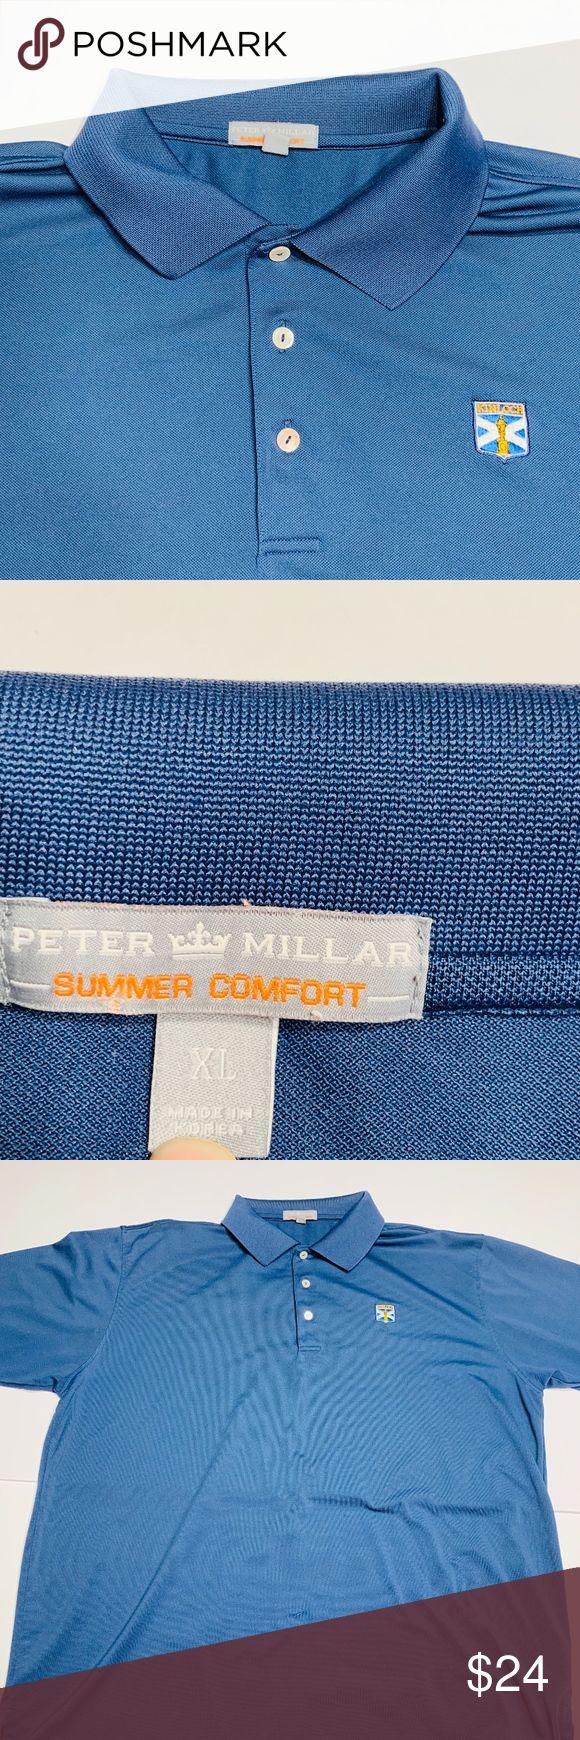 Peter Millar Summer Comfort Kinloch Logo XLarge Peter